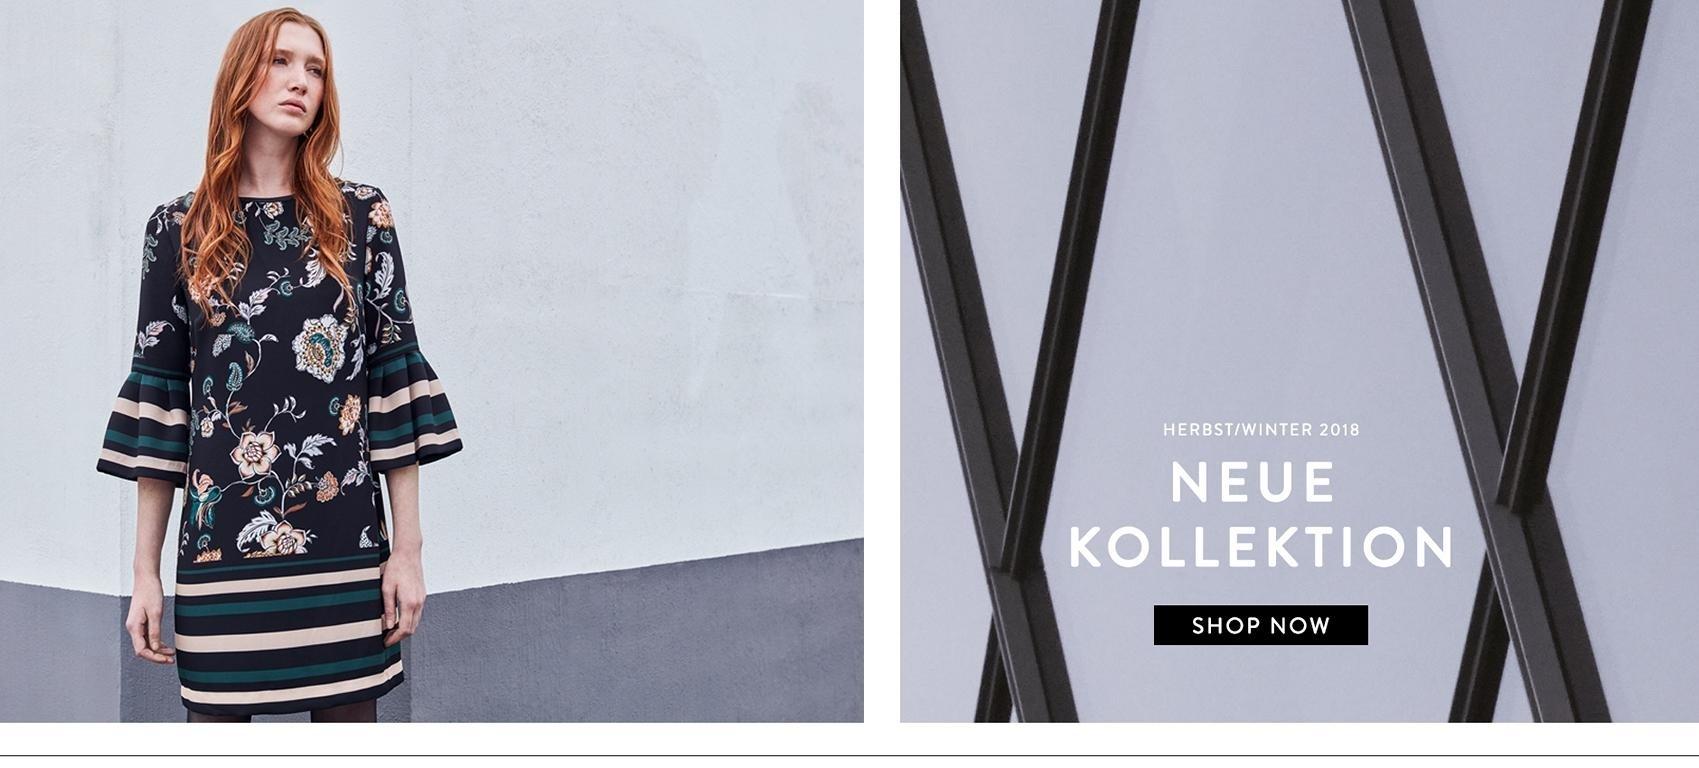 20 Kreativ Festtagskleider Knielang für 2019Designer Kreativ Festtagskleider Knielang Vertrieb